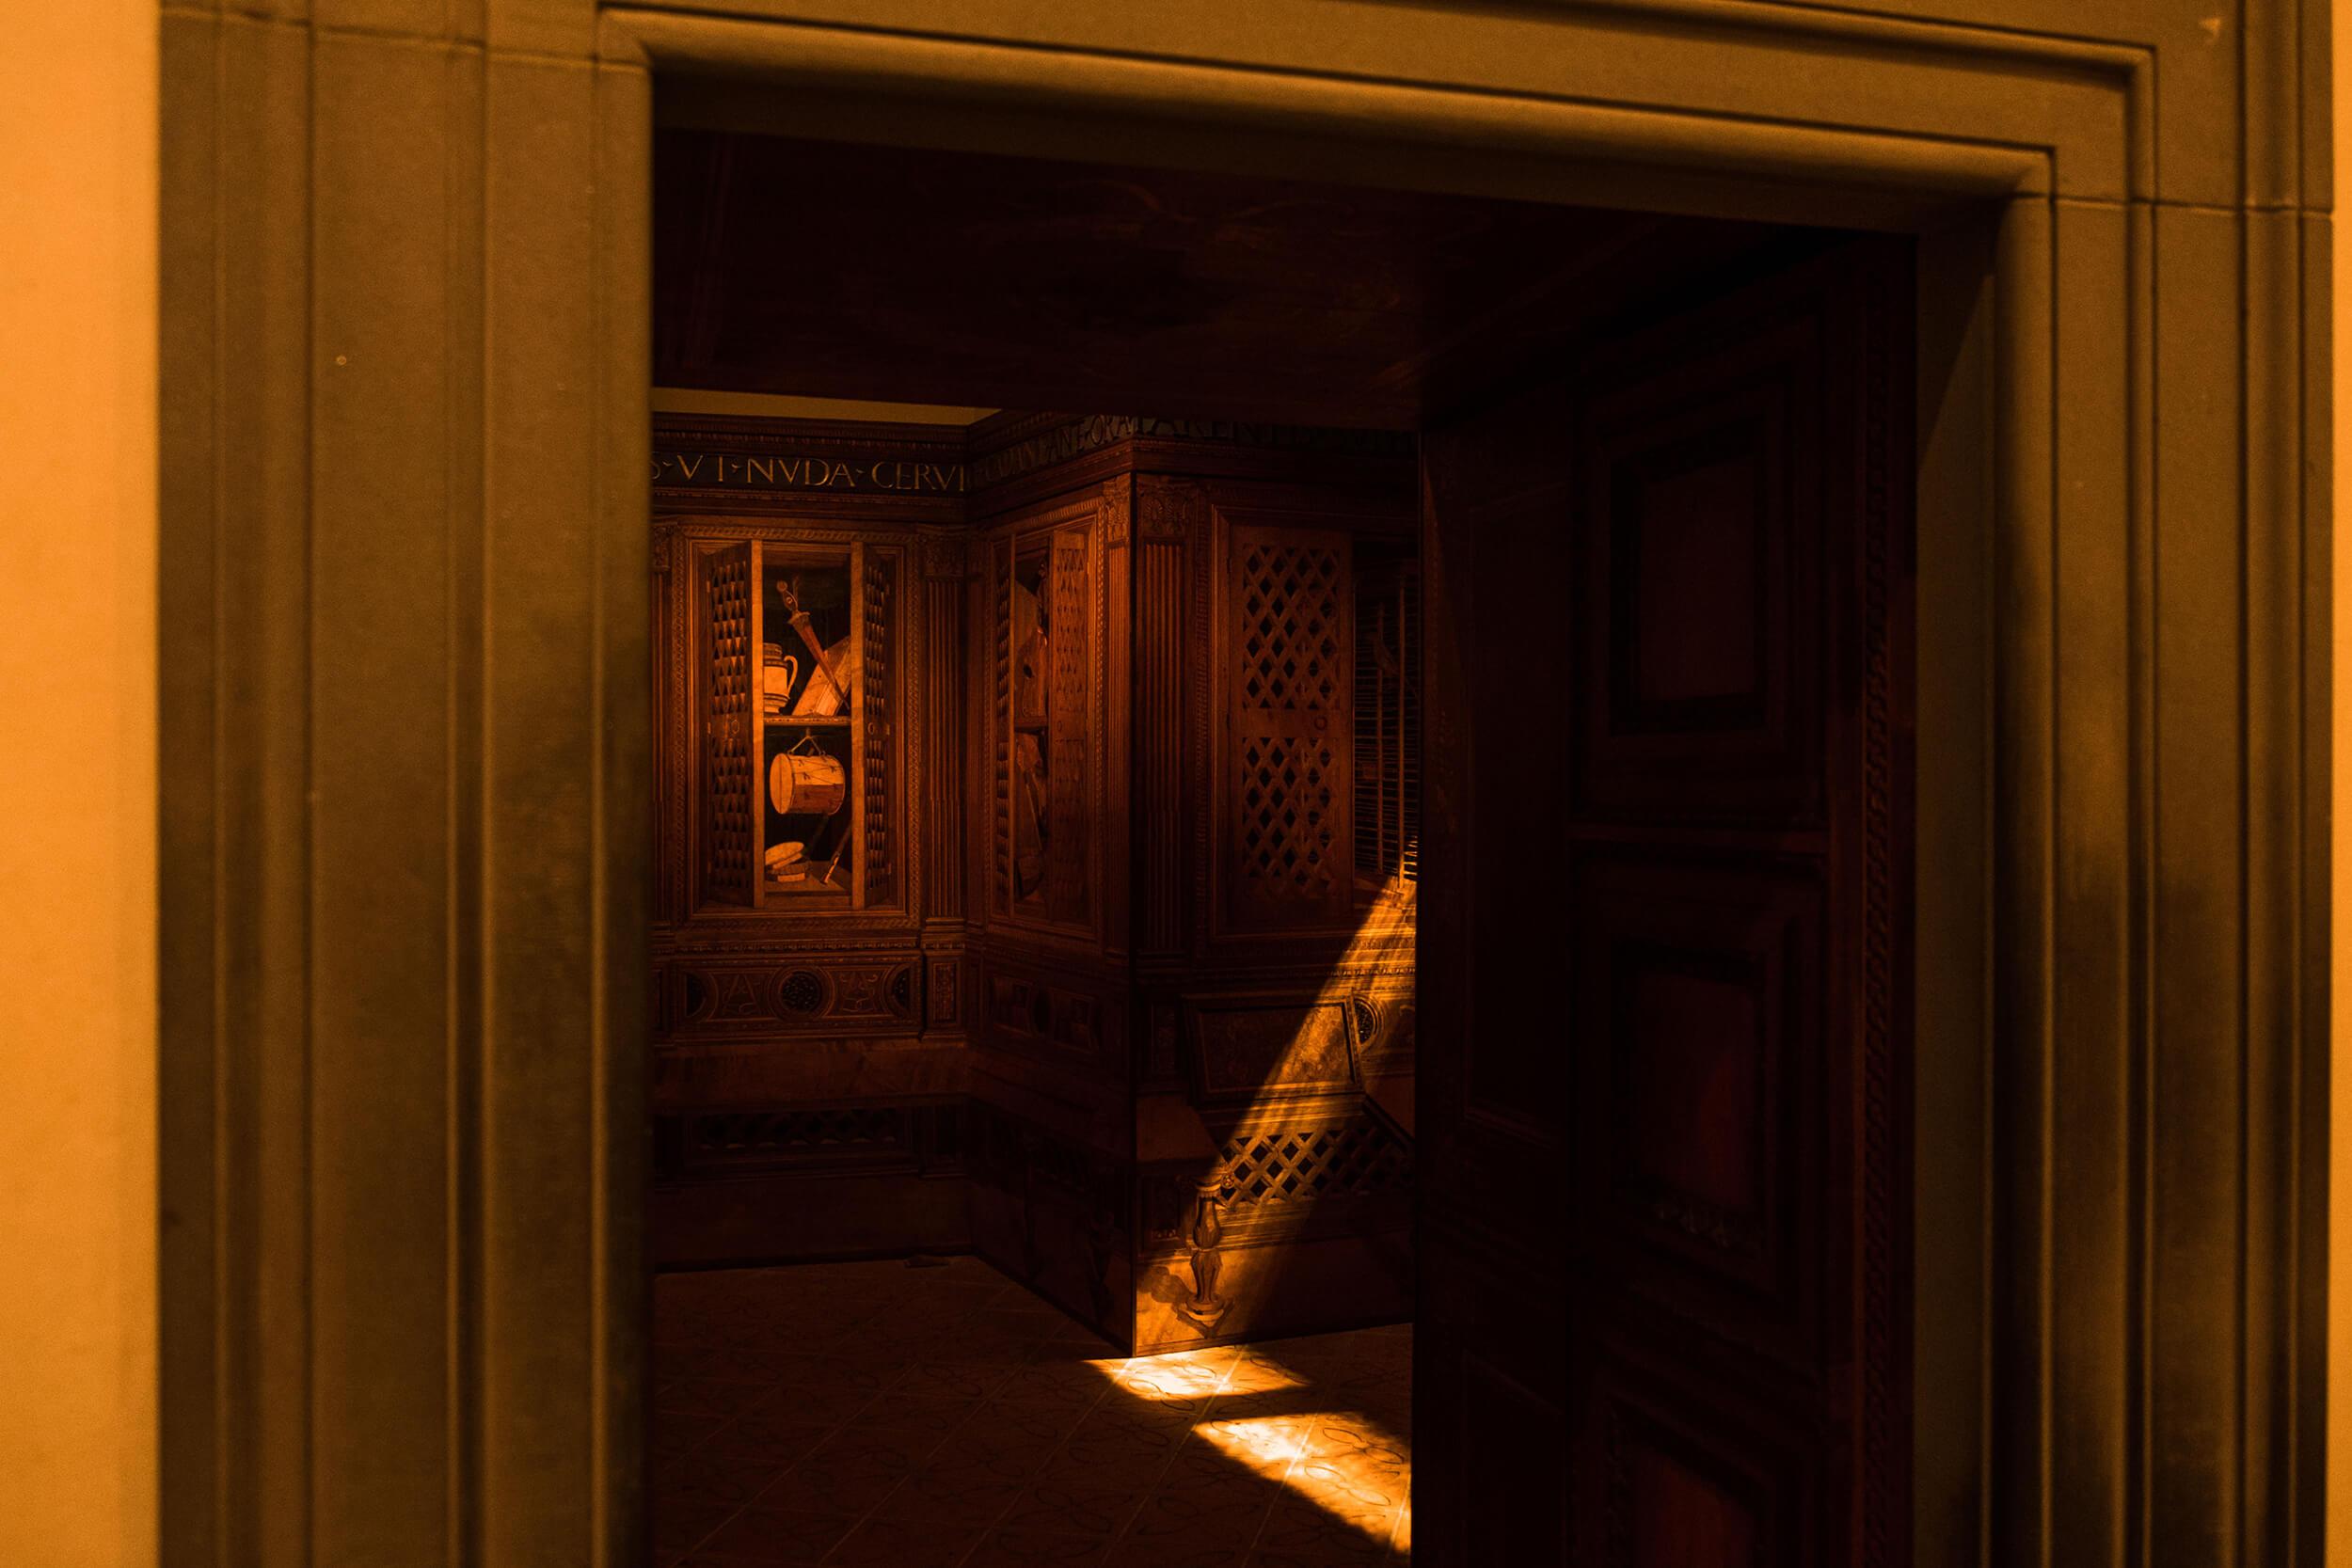 mystic-light-met-museum.jpg